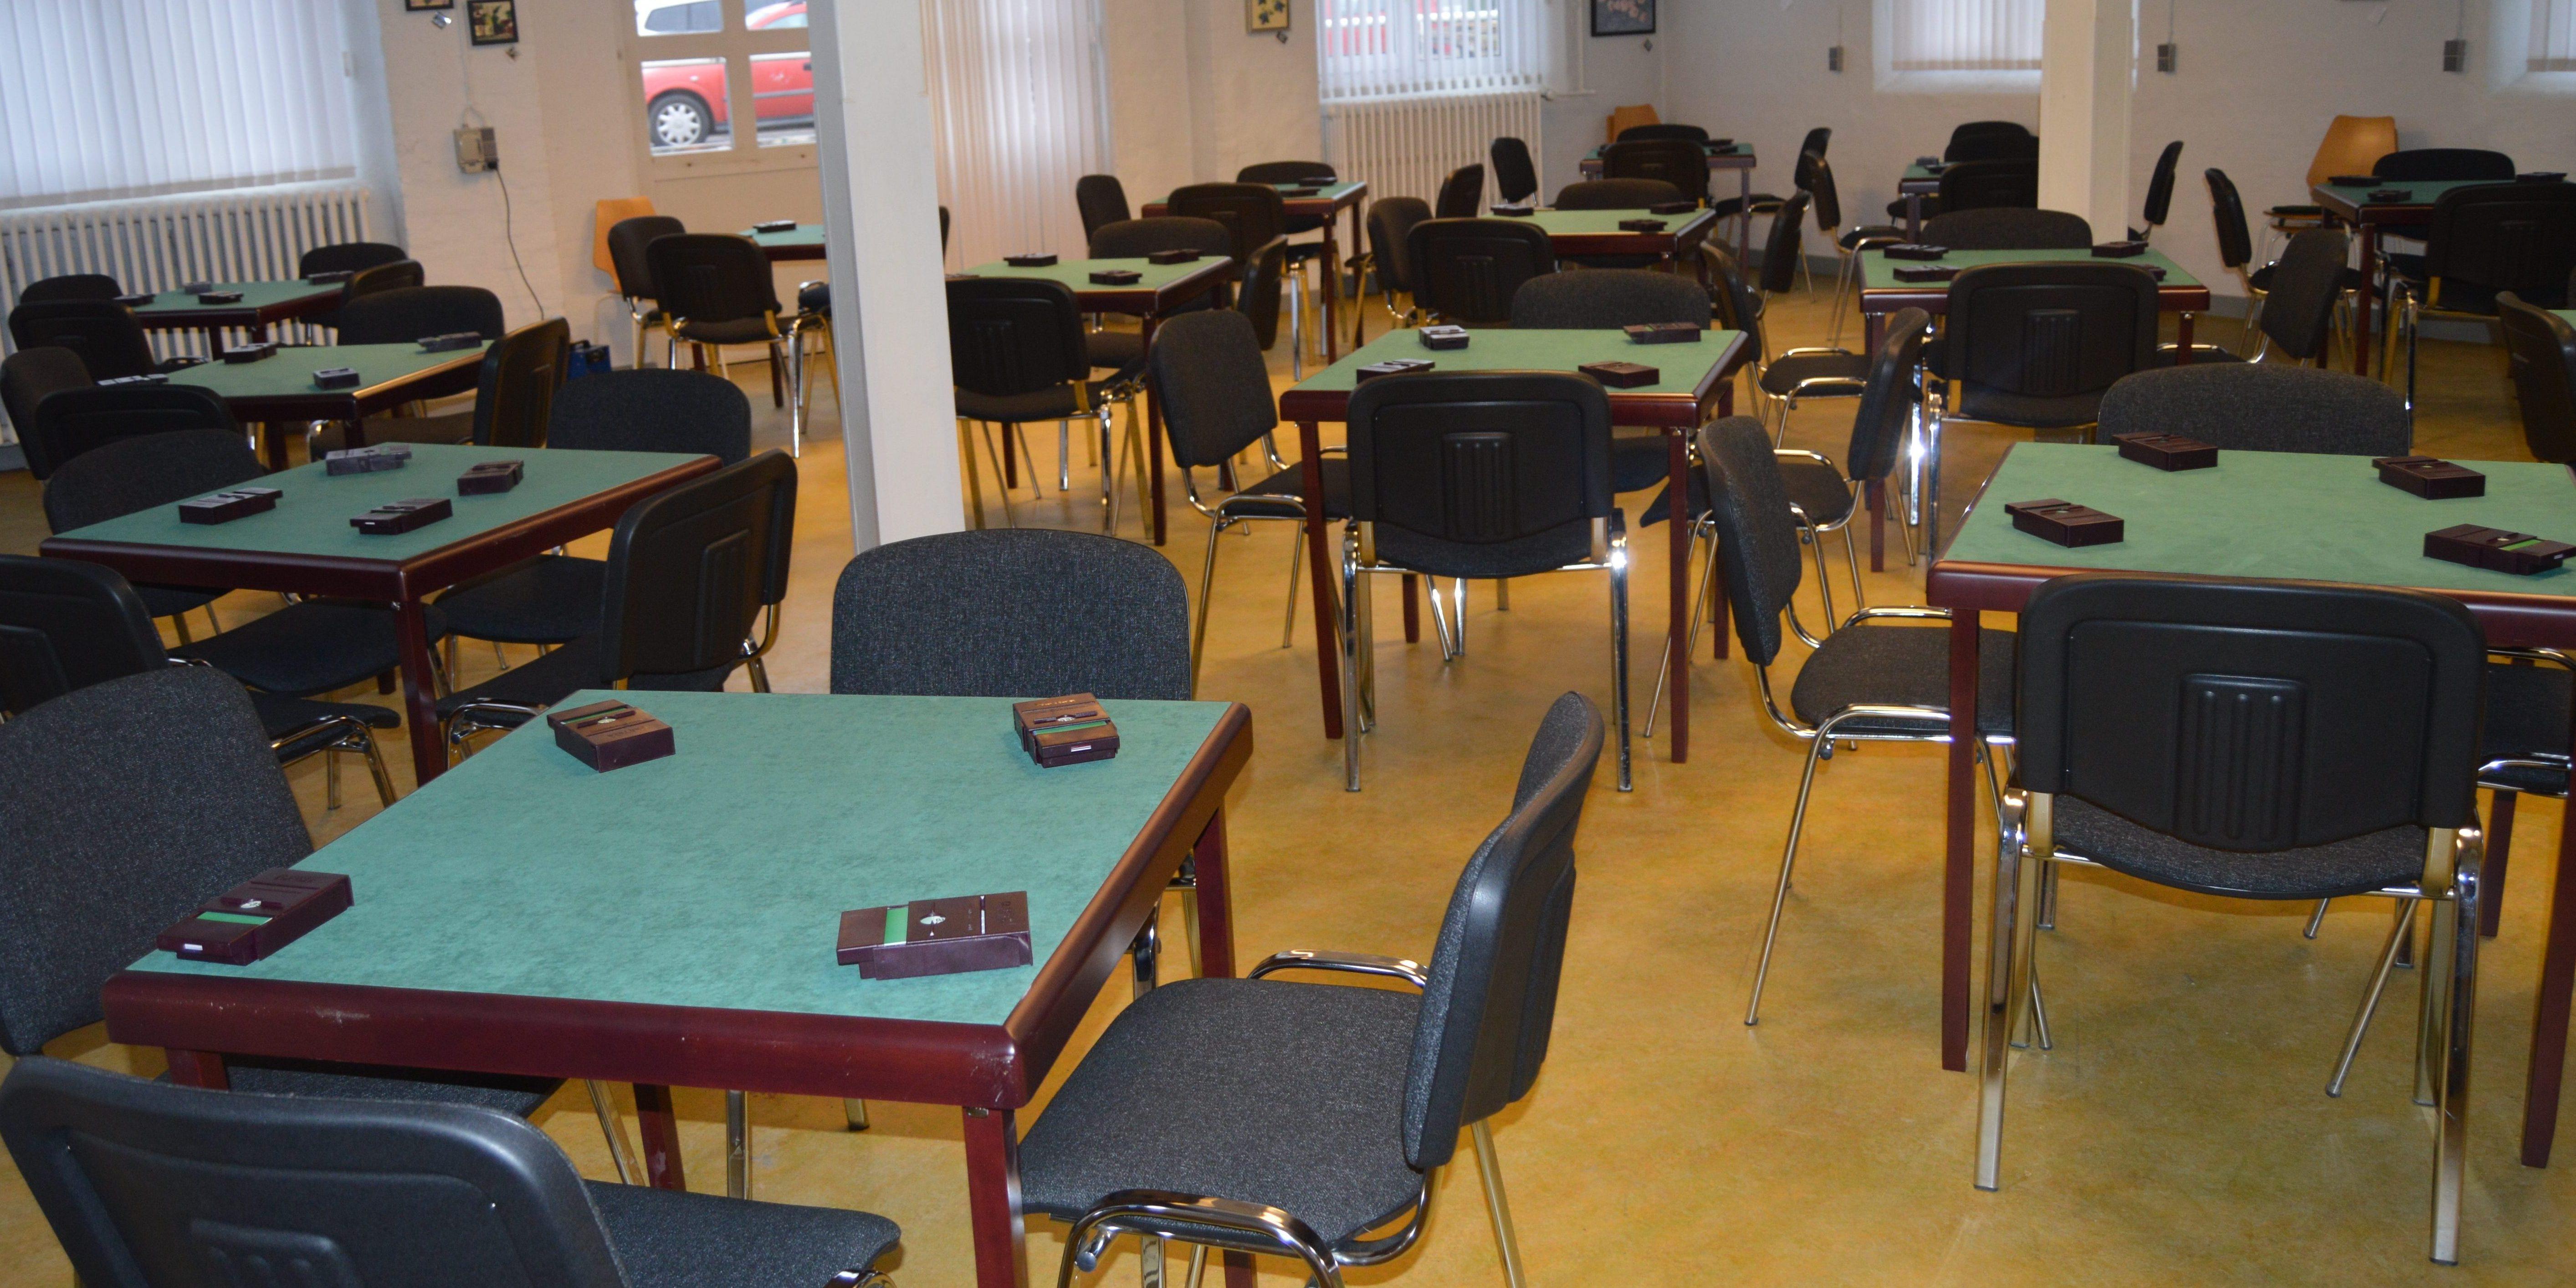 Spillelokale Stuen